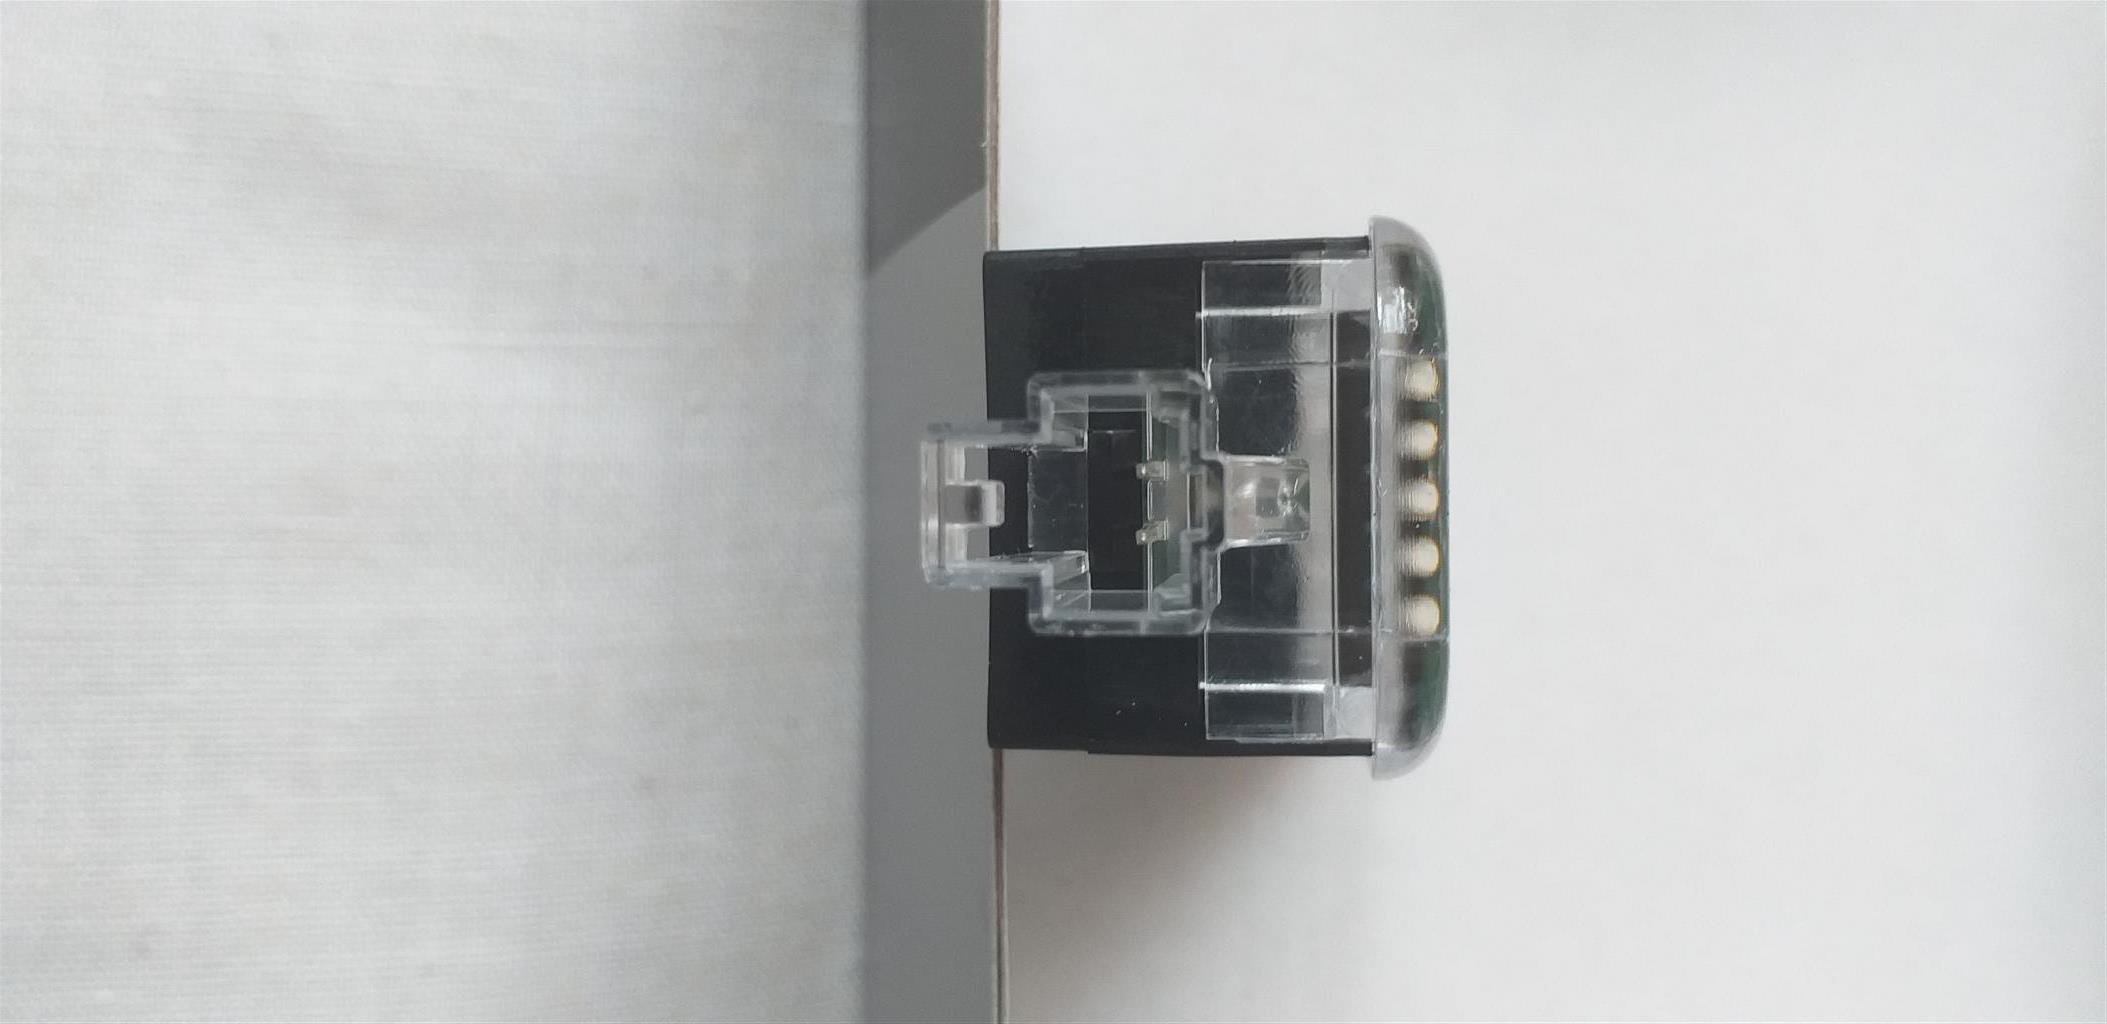 fwe bike lights instructions